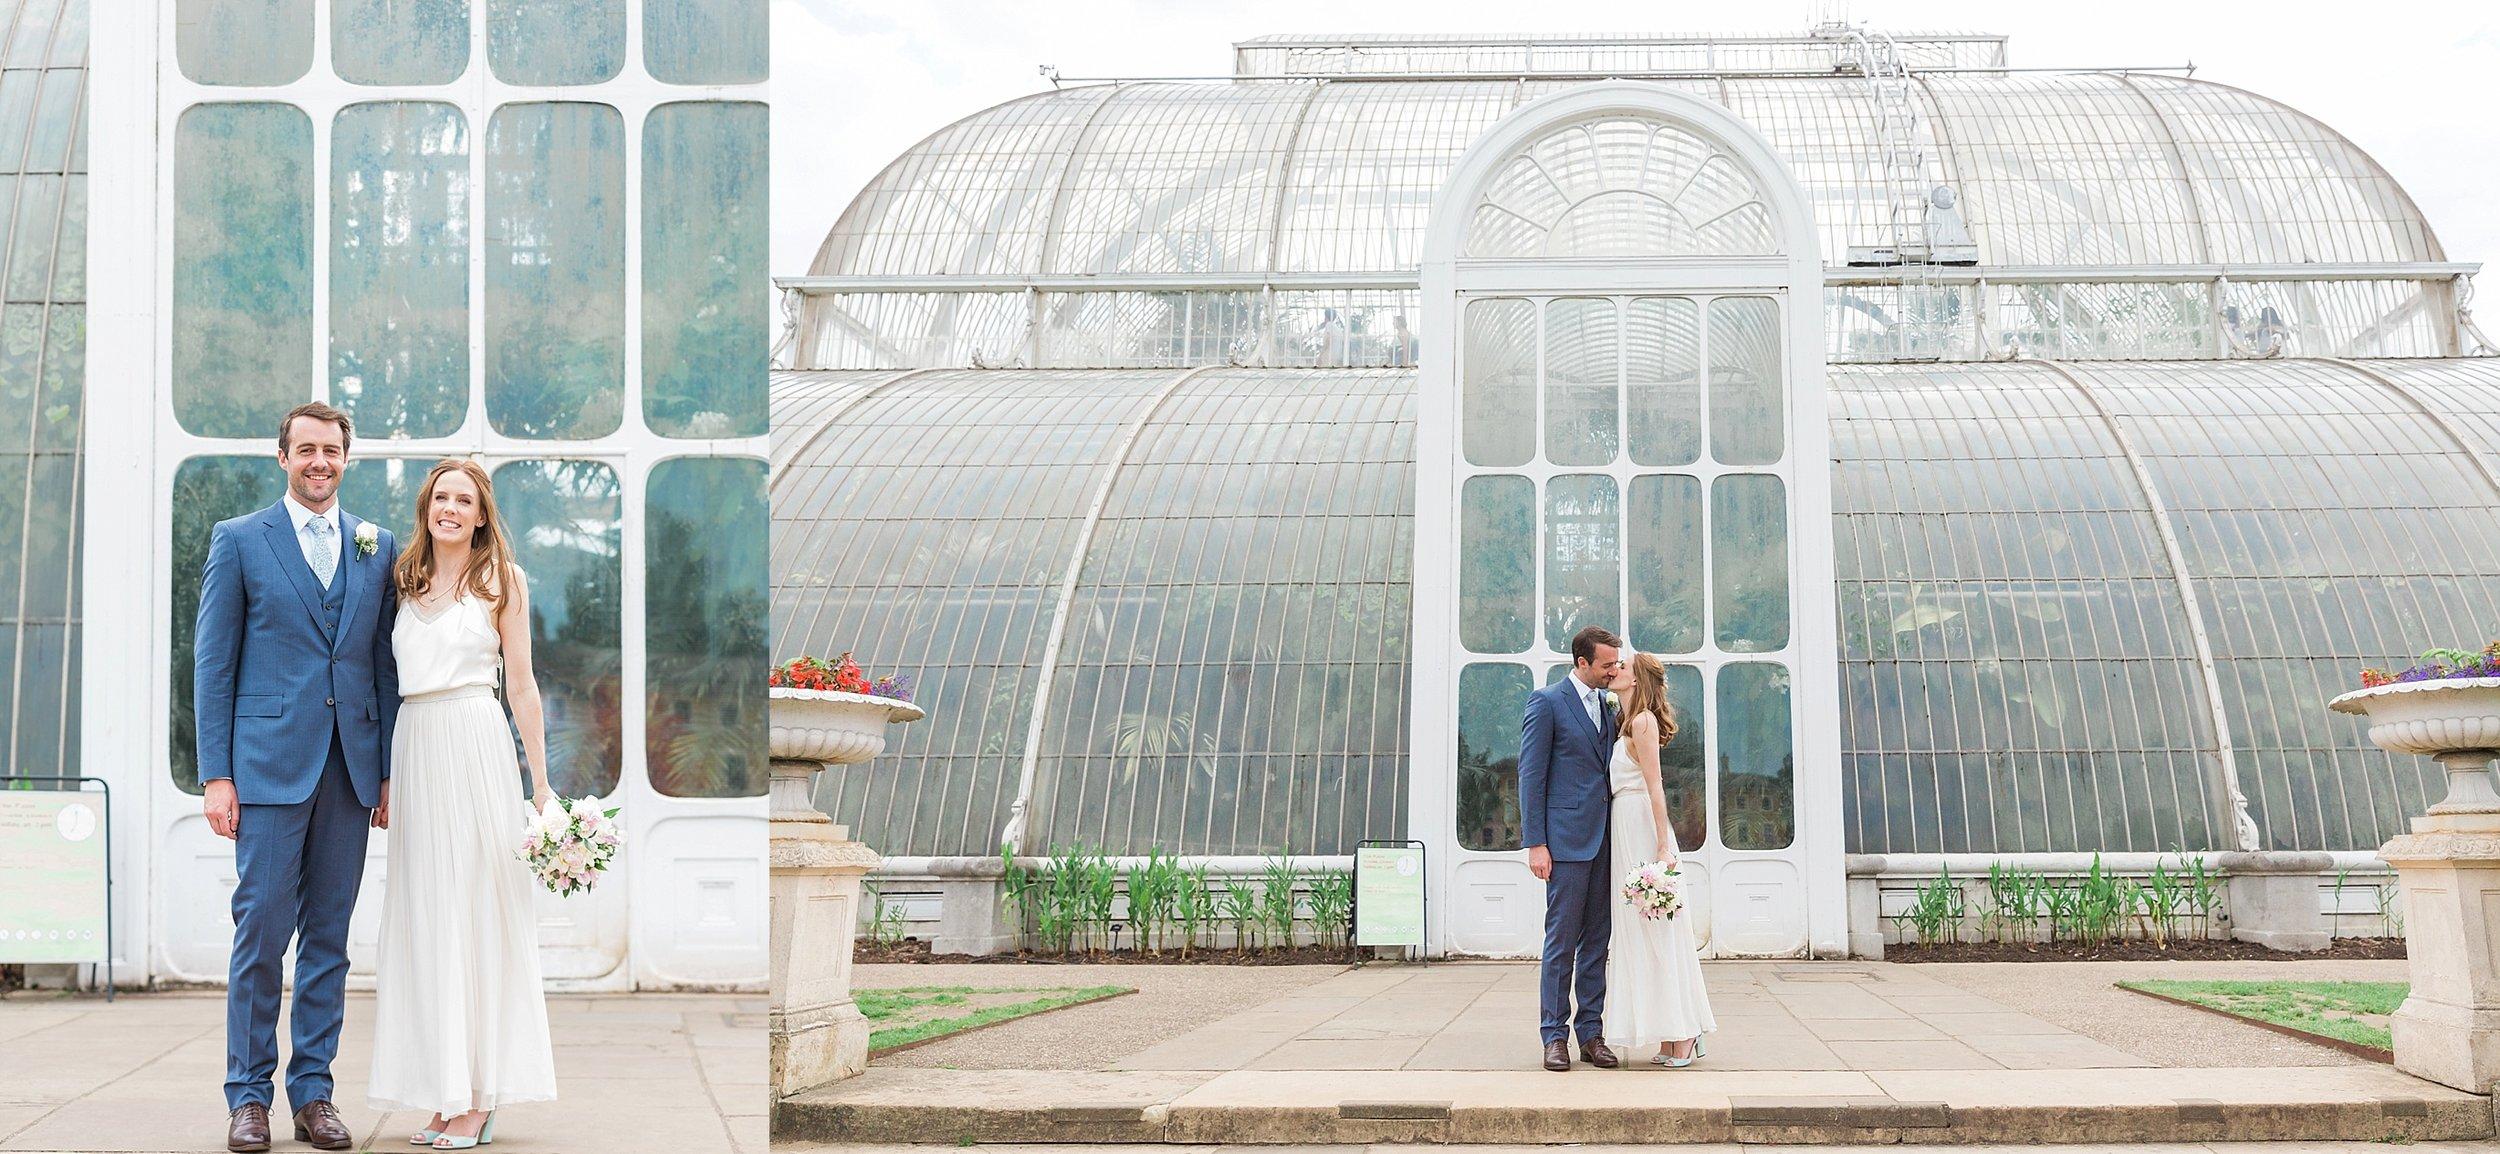 wedding photographer at kew gardens.jpg